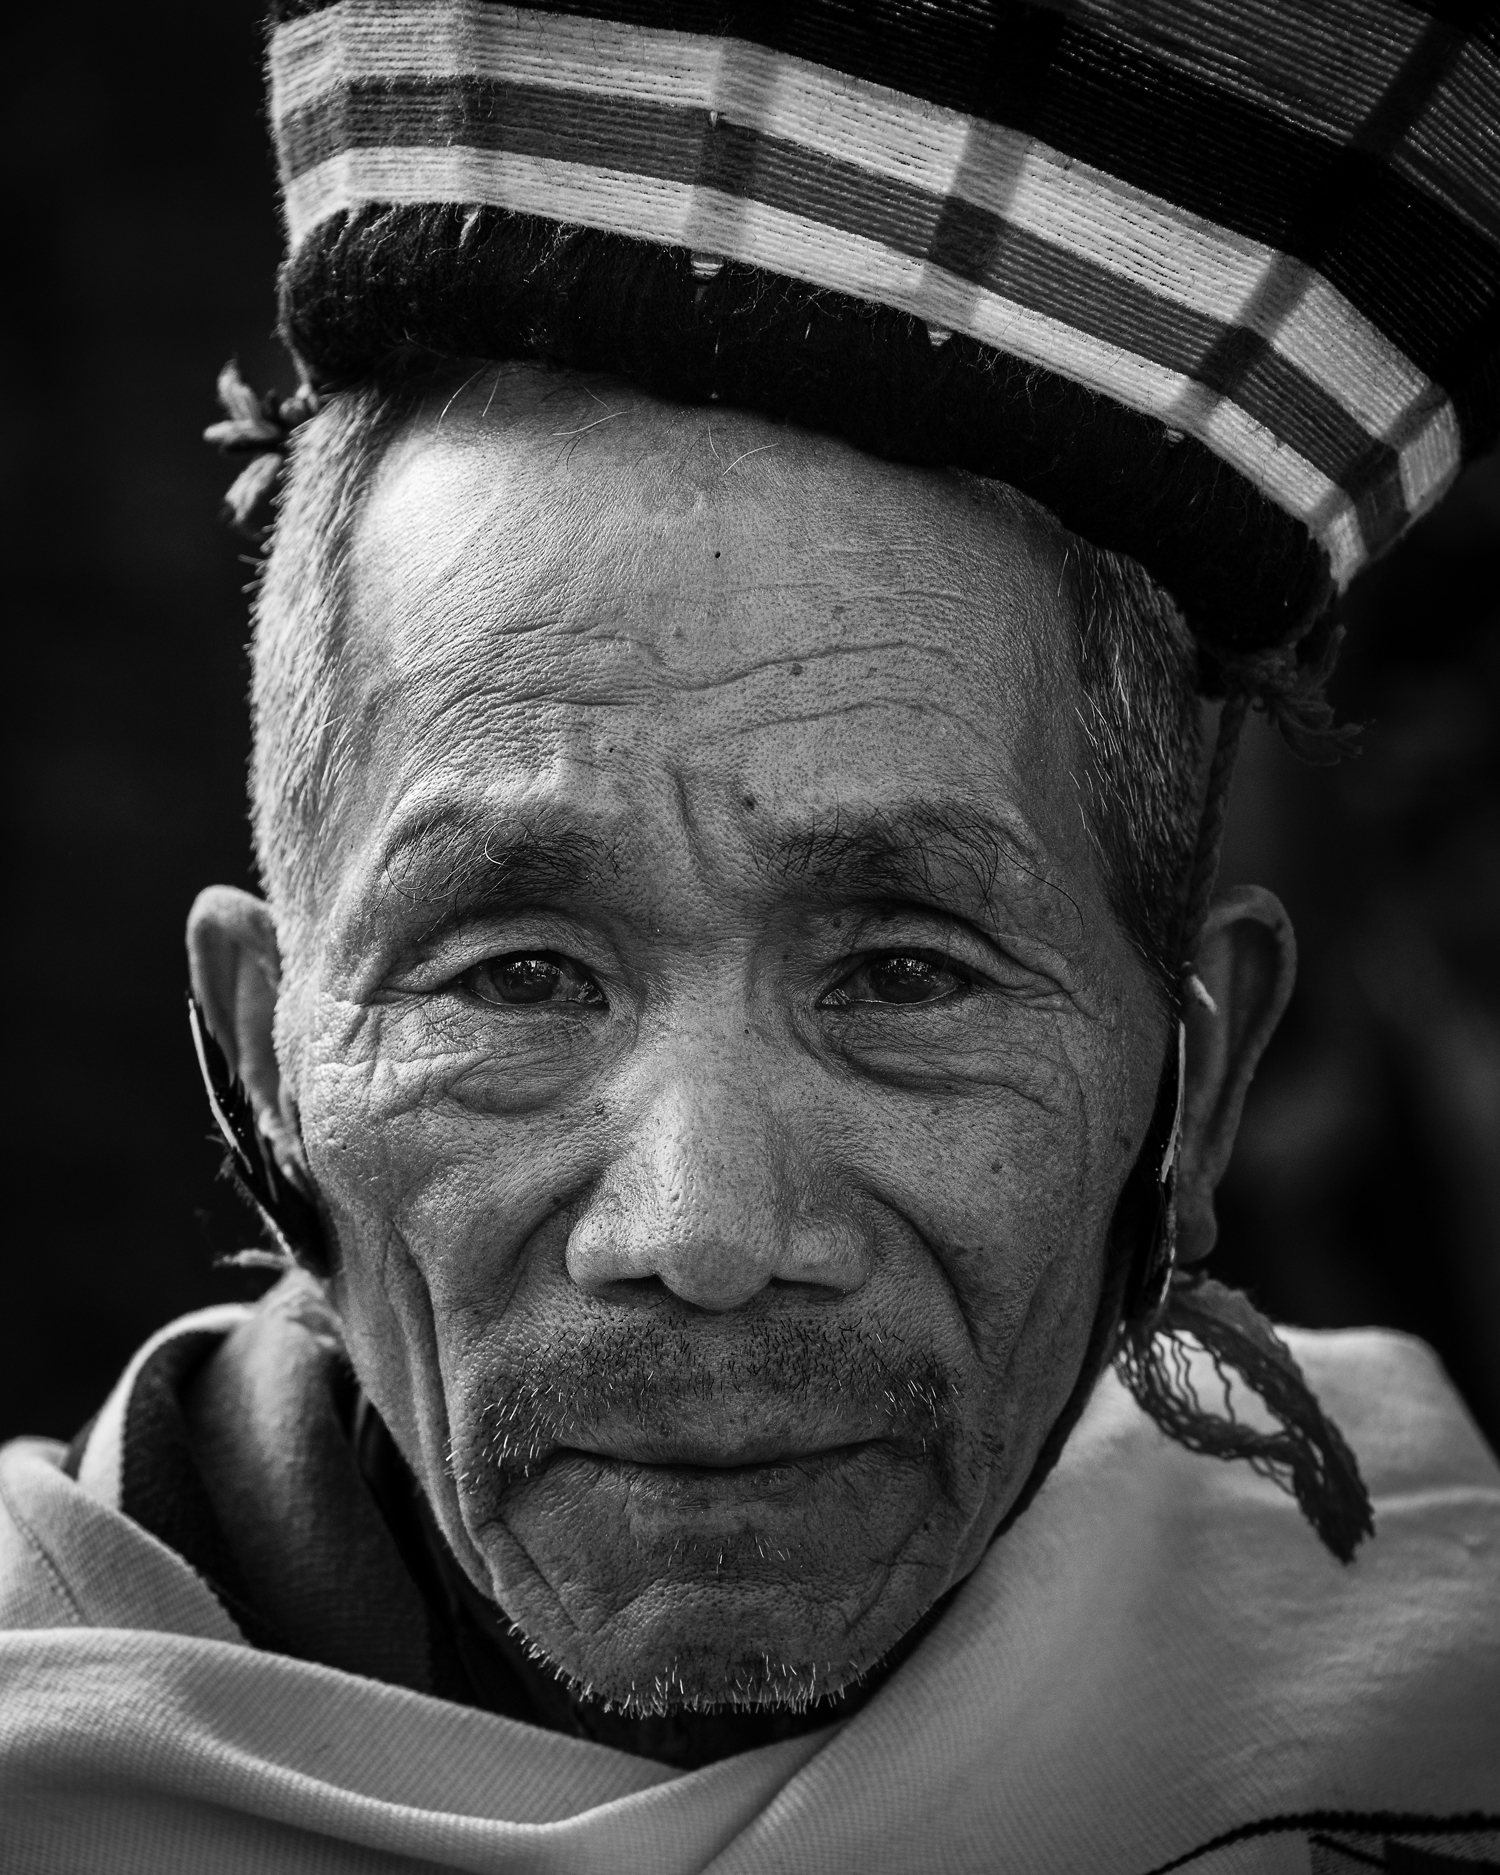 Portrait of a Naga Tribal